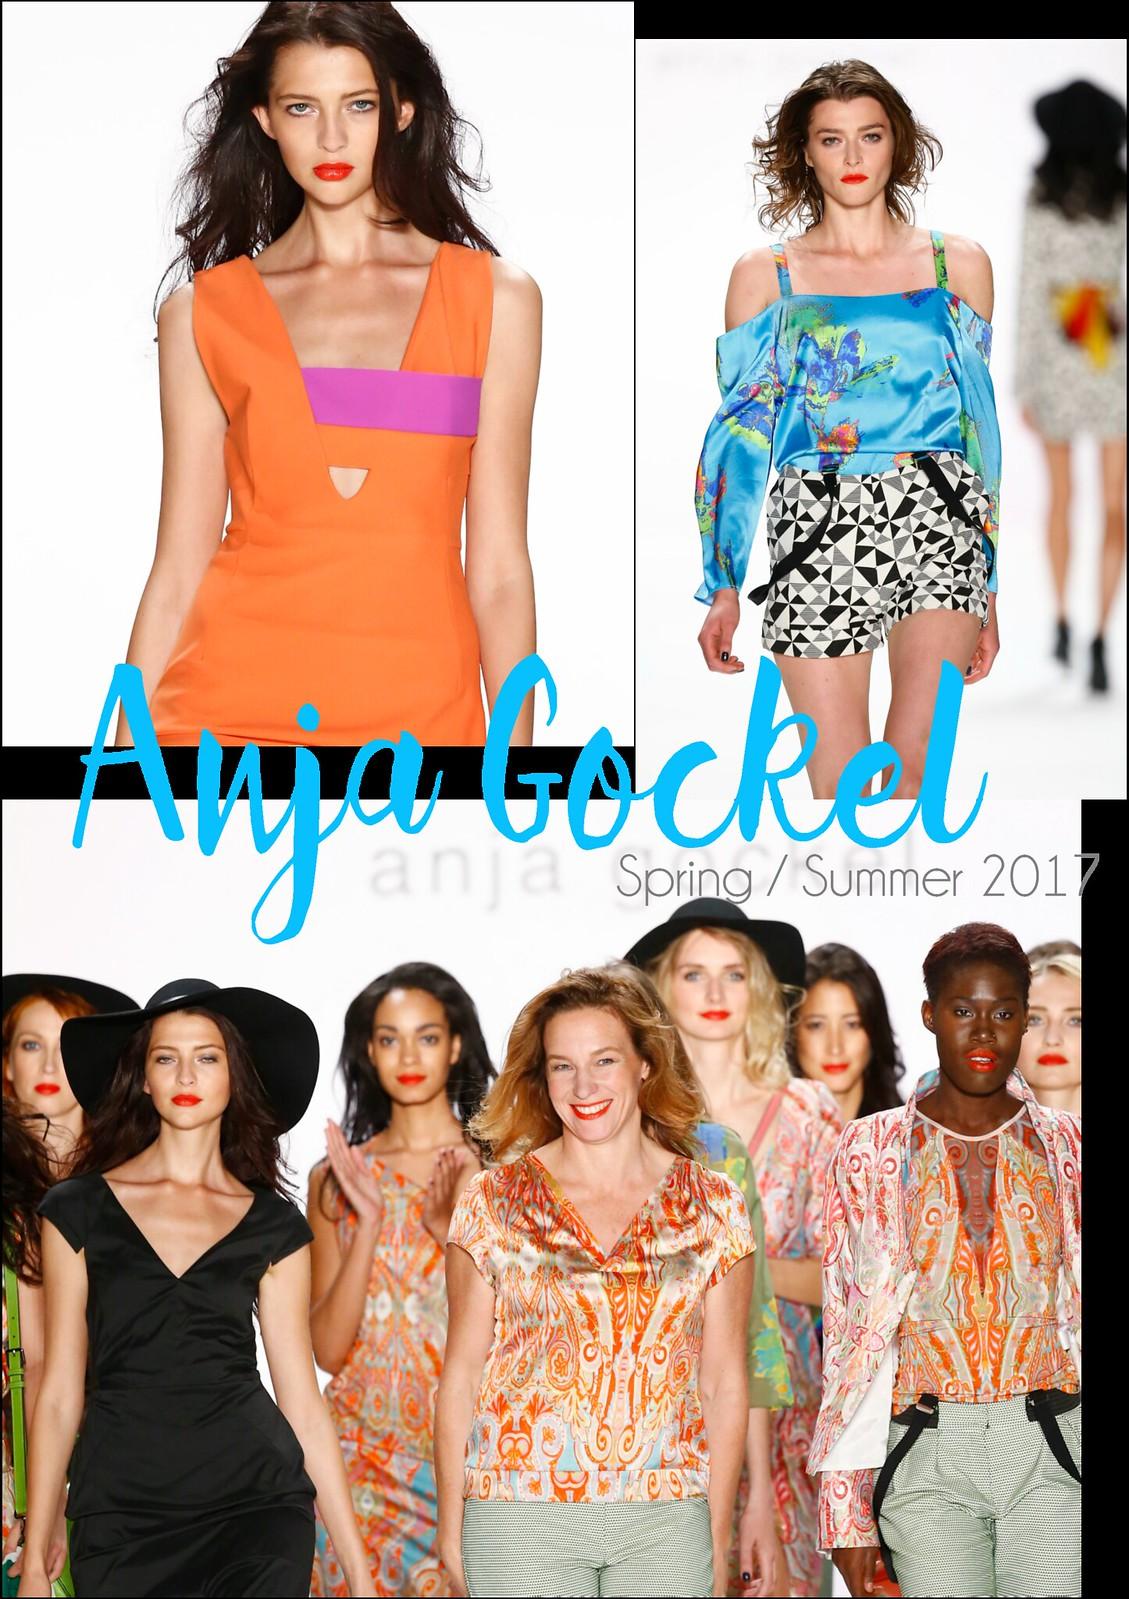 Kollektionsbericht Anja Gockel Spring Summer 2017 I Style By Charlotte